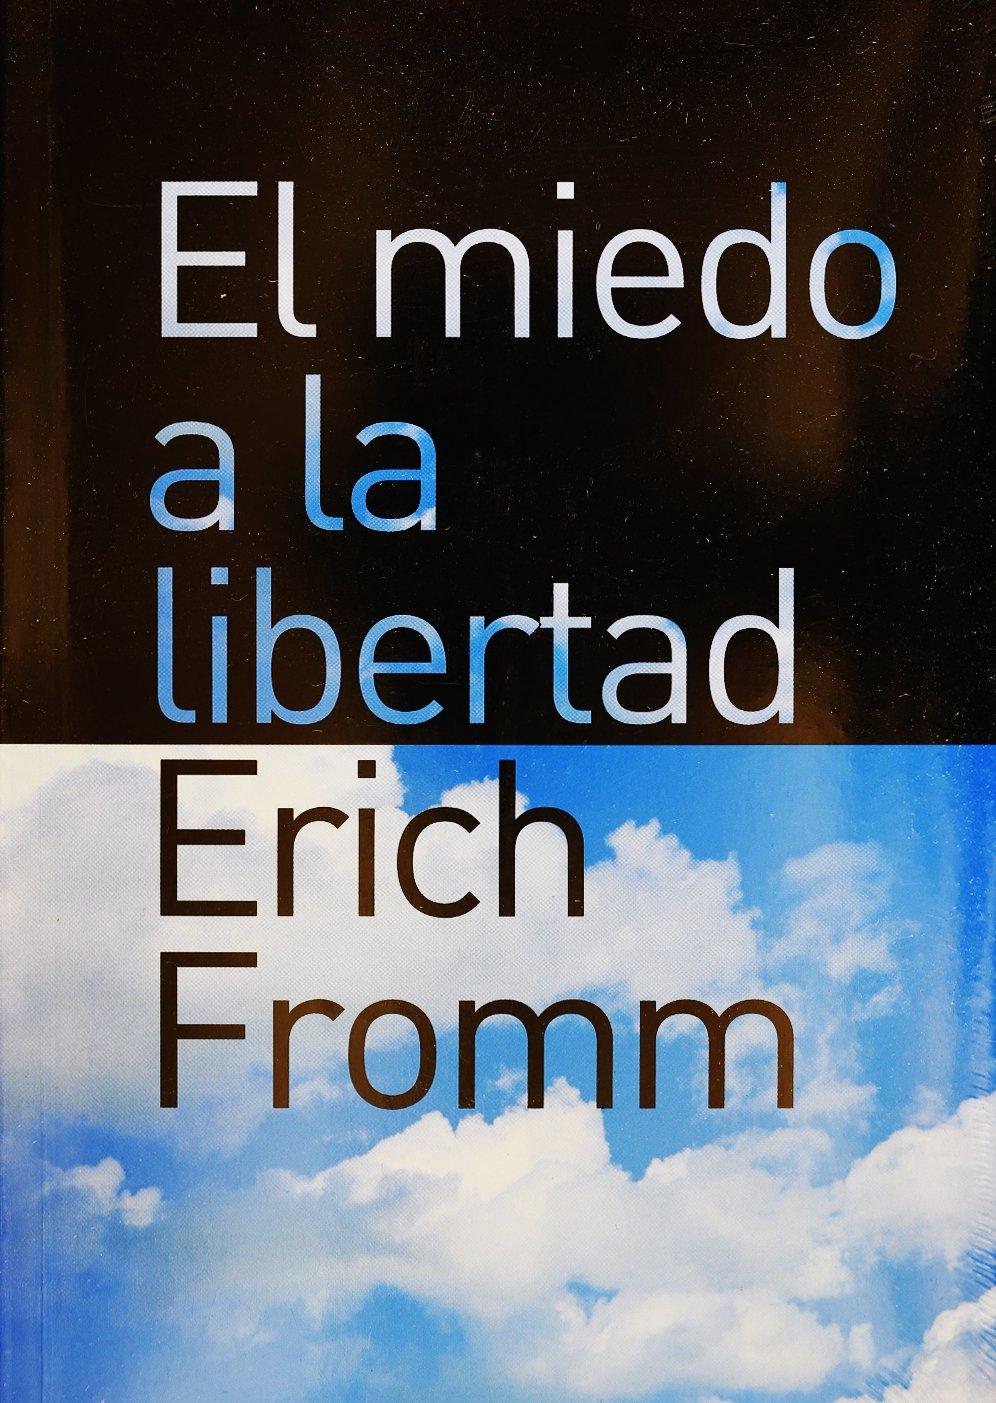 El miedo a la libertad (Spanish Edition): Erich Fromm: 9789688536377: Amazon.com: Books